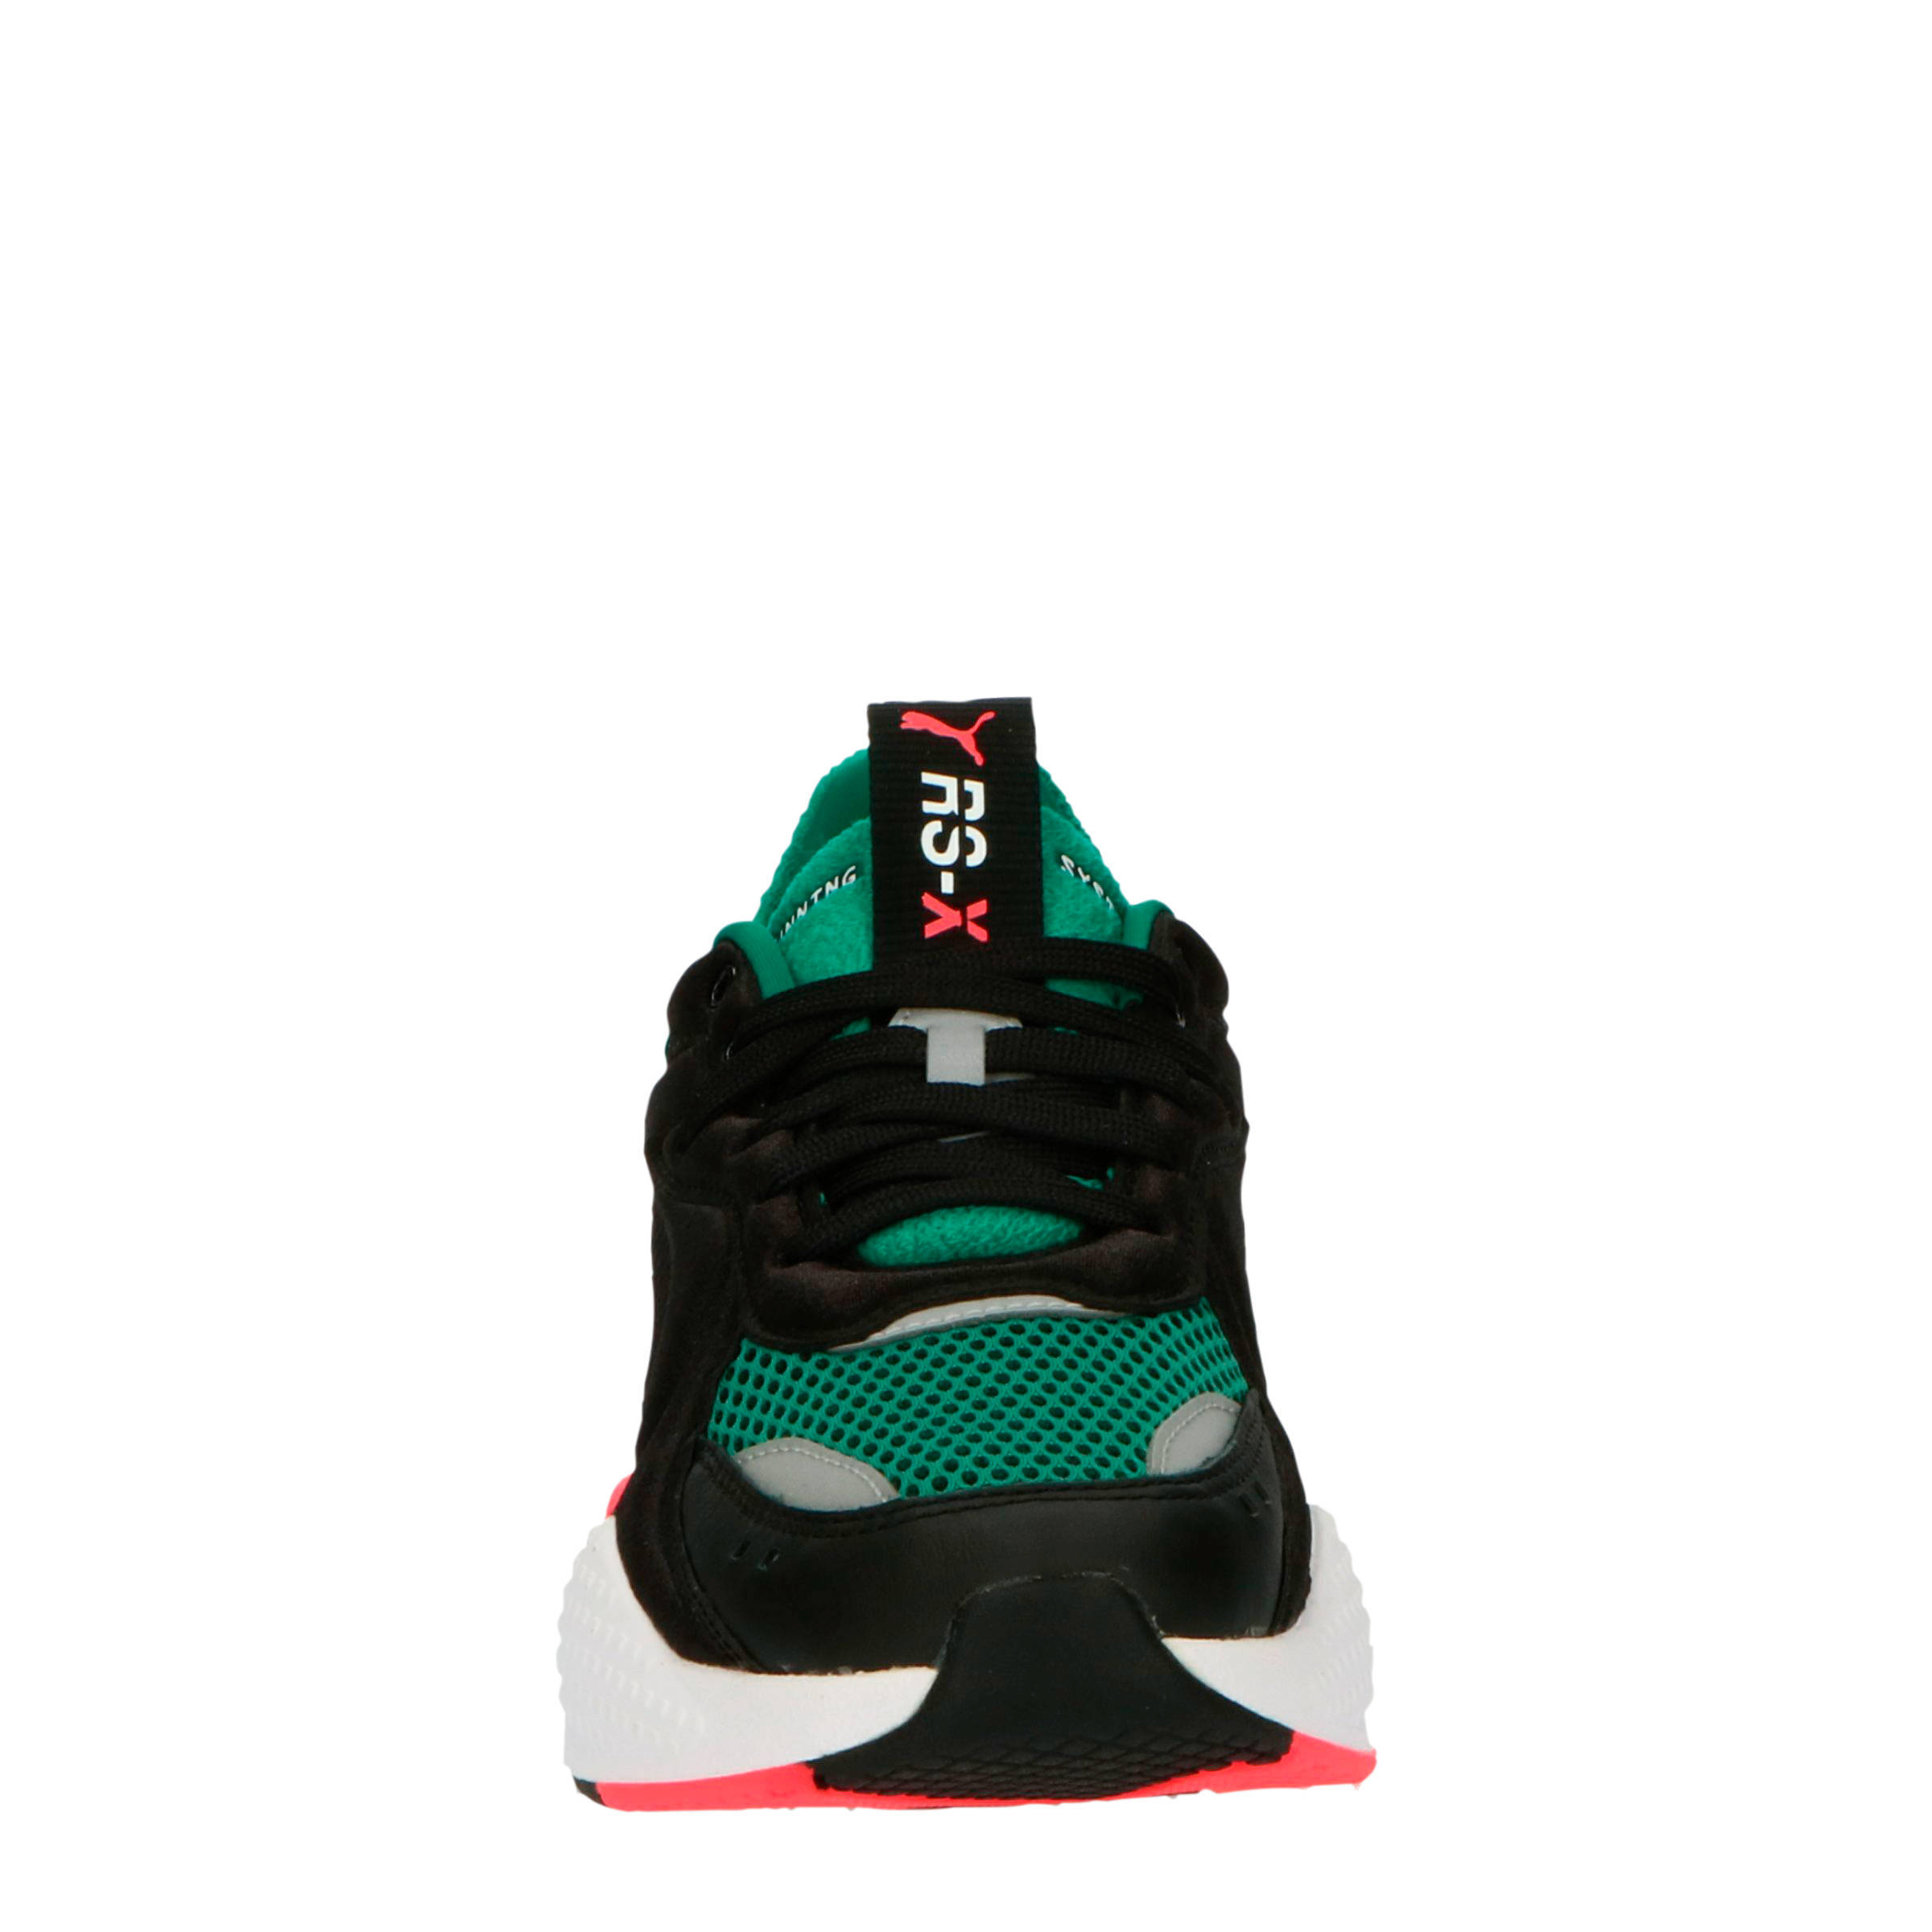 Puma RS X Softcase sneakers zwart/groen/oranje | wehkamp